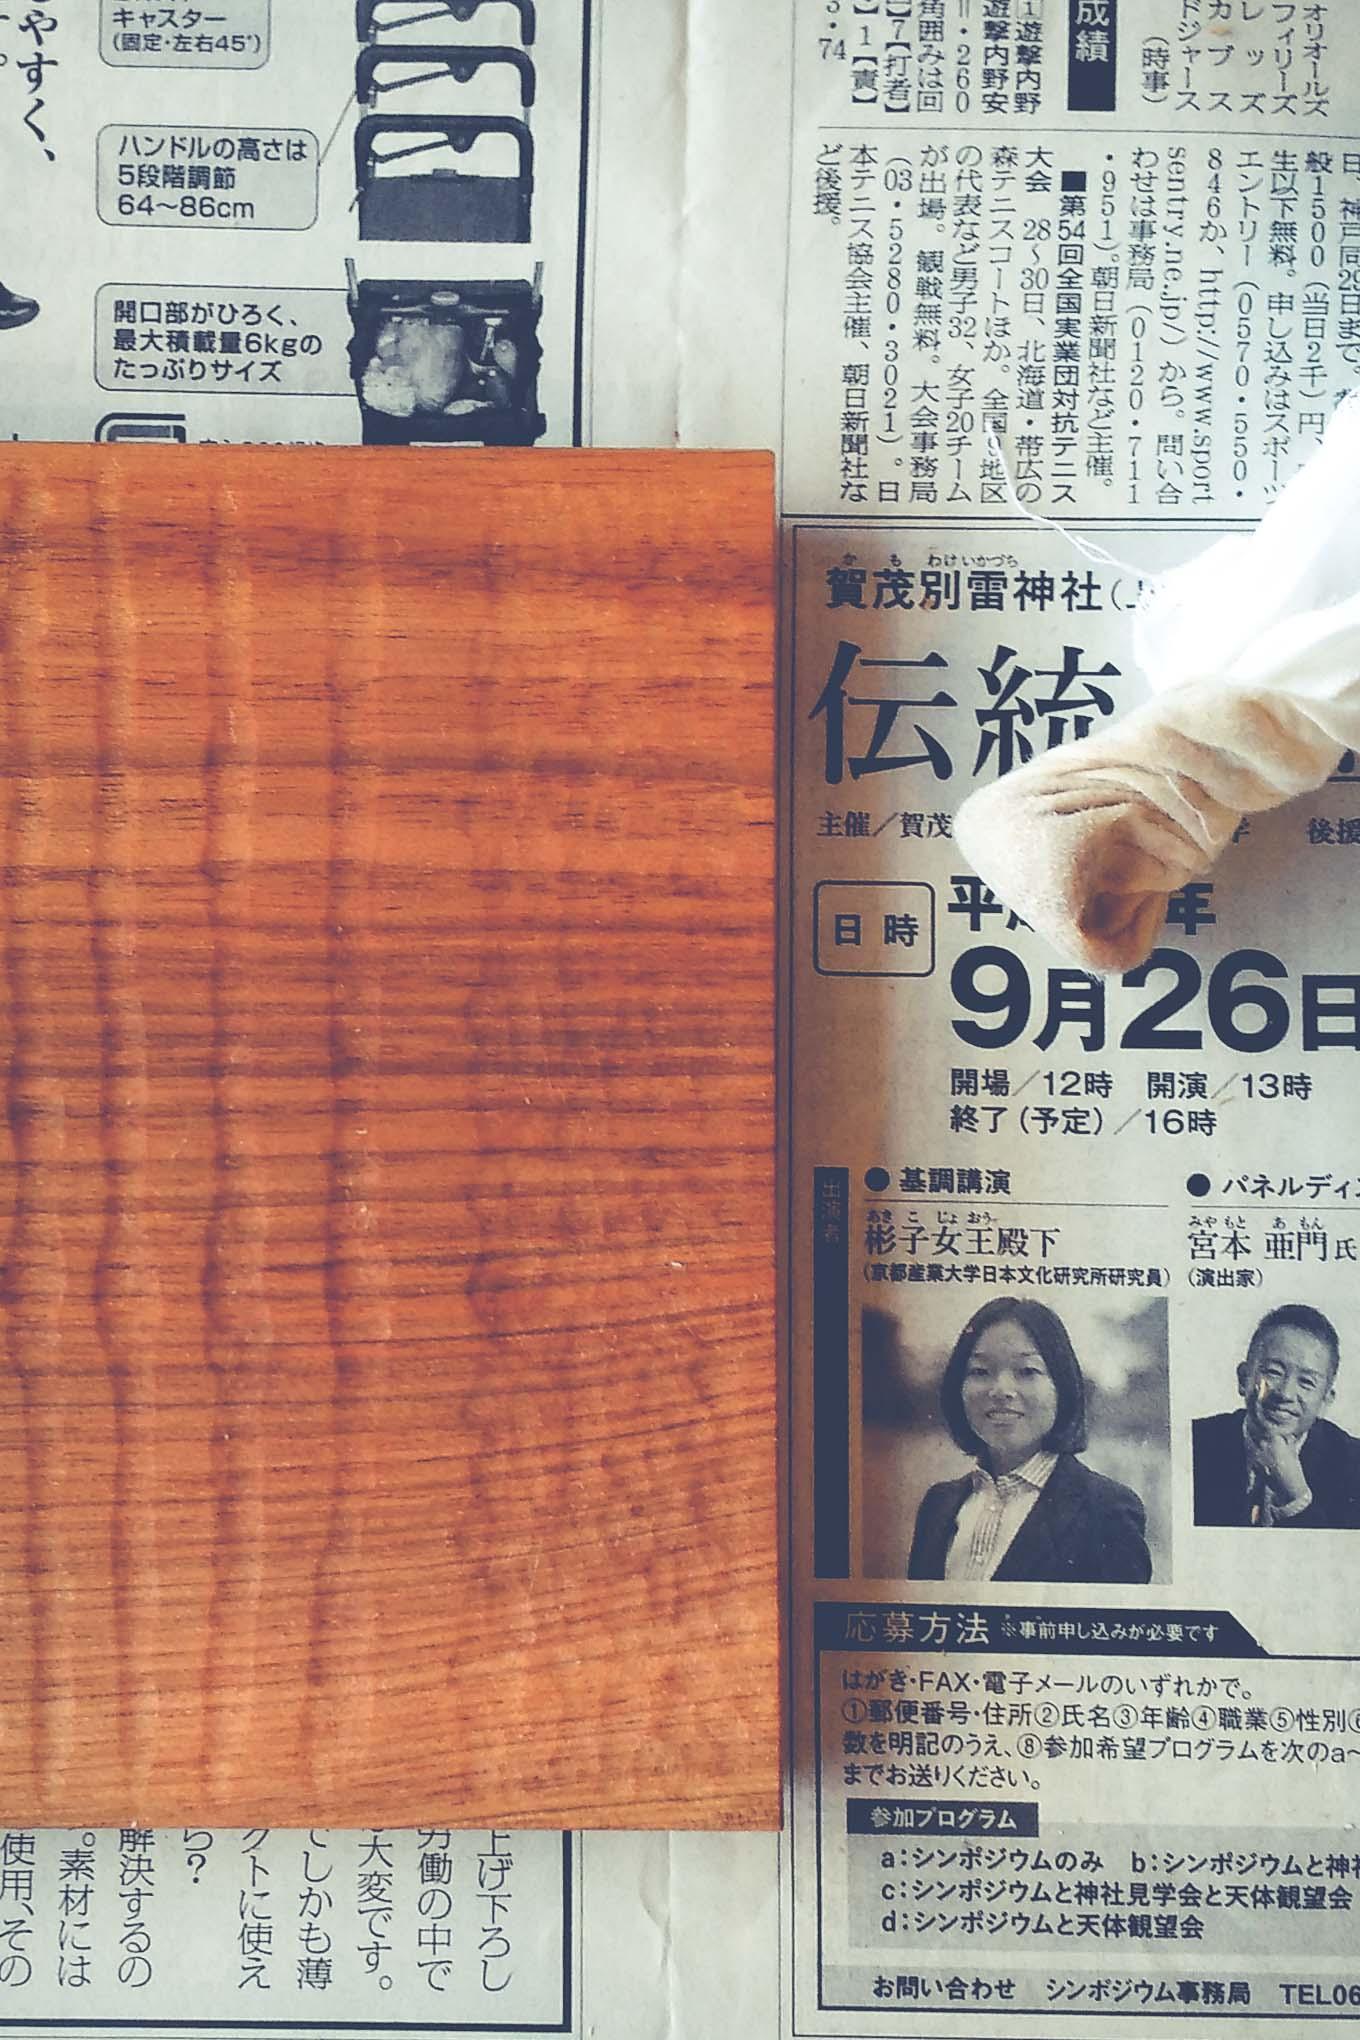 kaga-masayuki-wood-plate-10